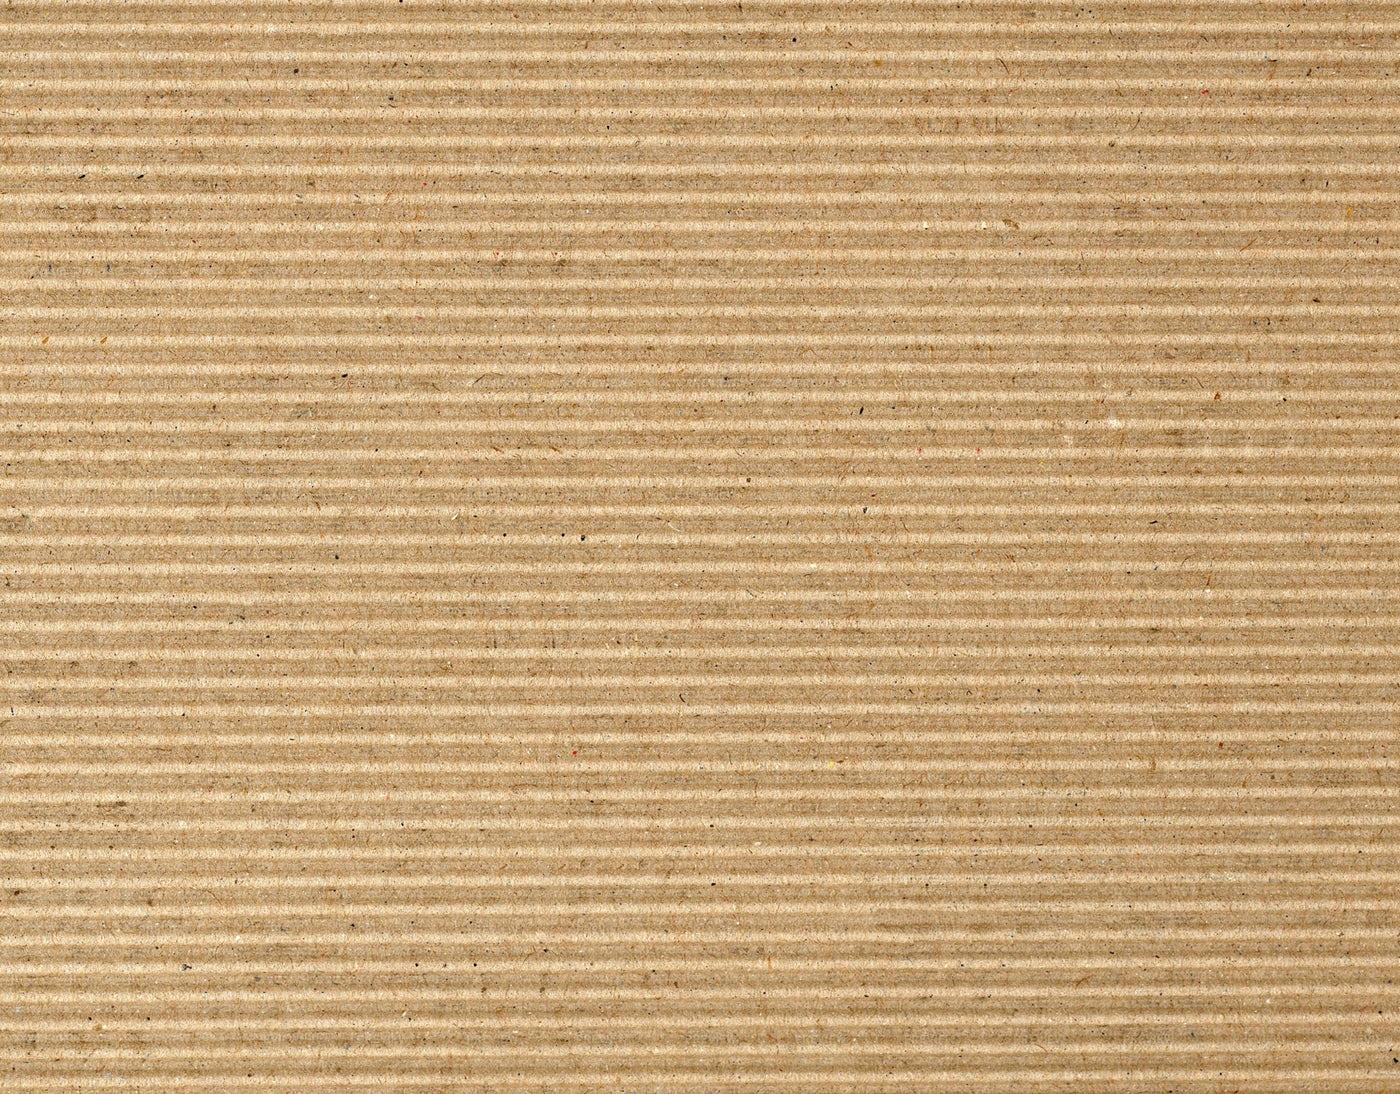 Corrugated Cardboad, Horizontal Lines: Stock Photos